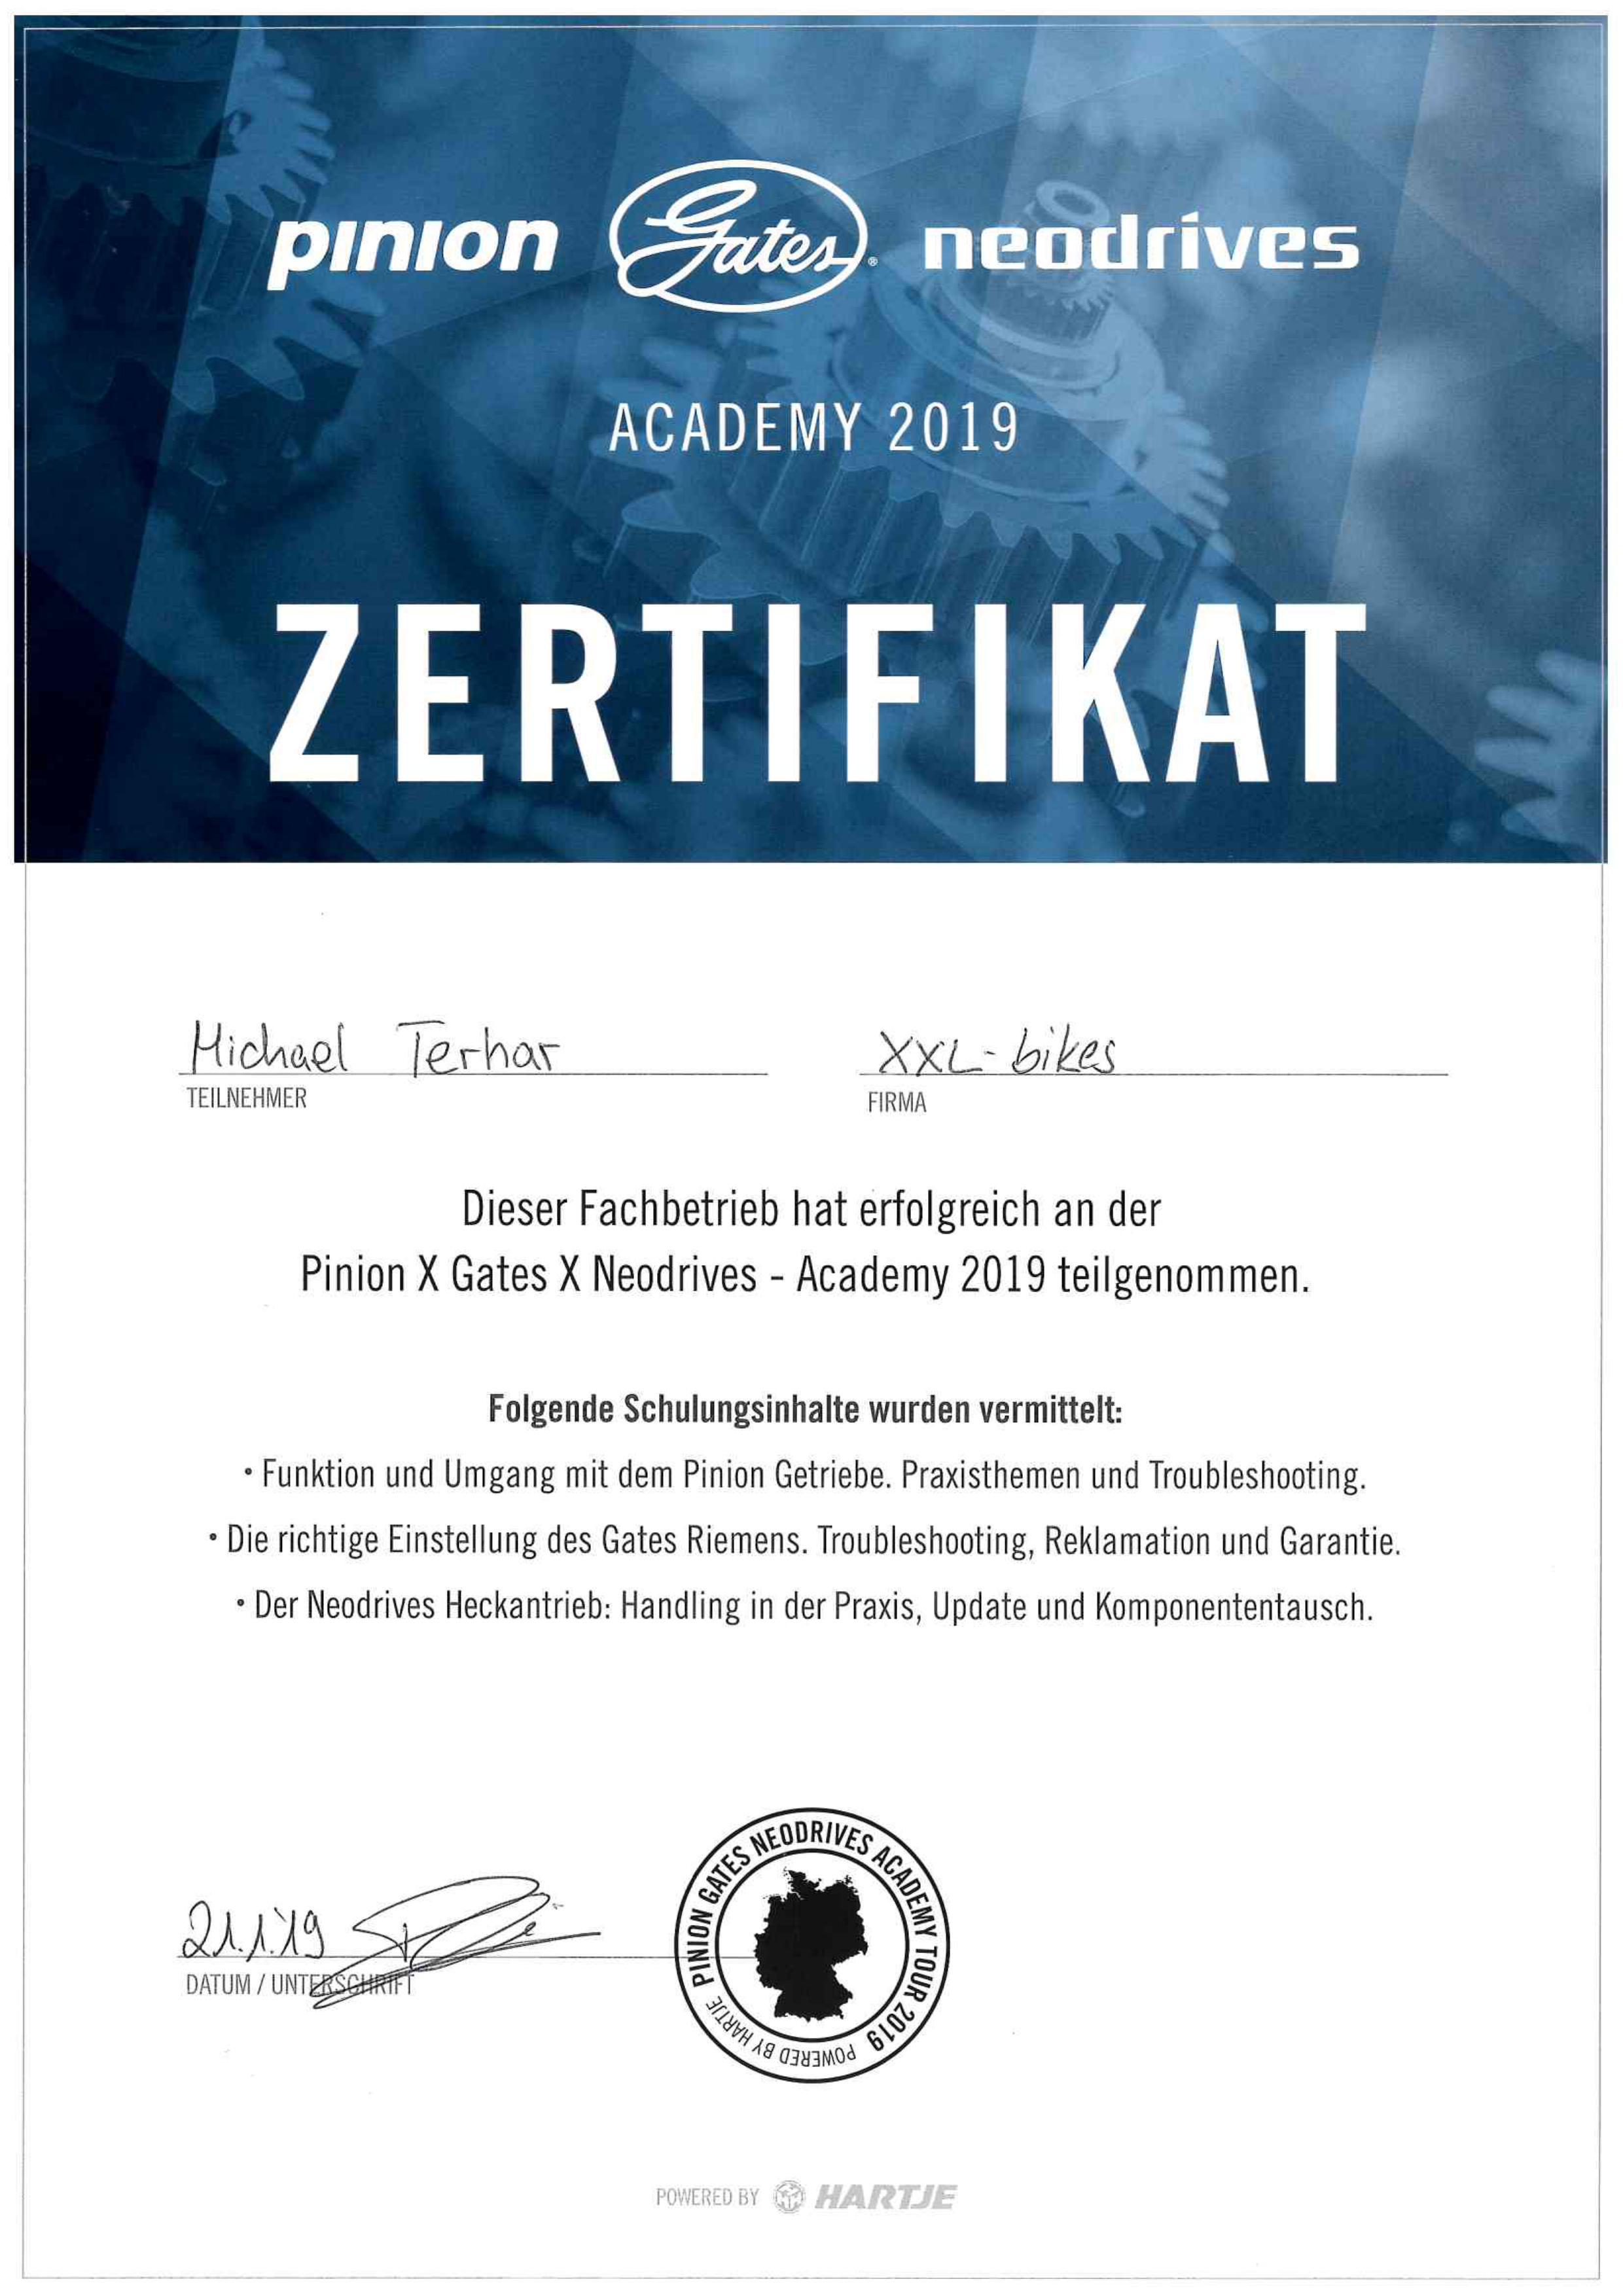 78e59ba8c7dee1 ... Pinion - Gates - Neodrives Academy 2019 - Zertifikat Michael Terhar